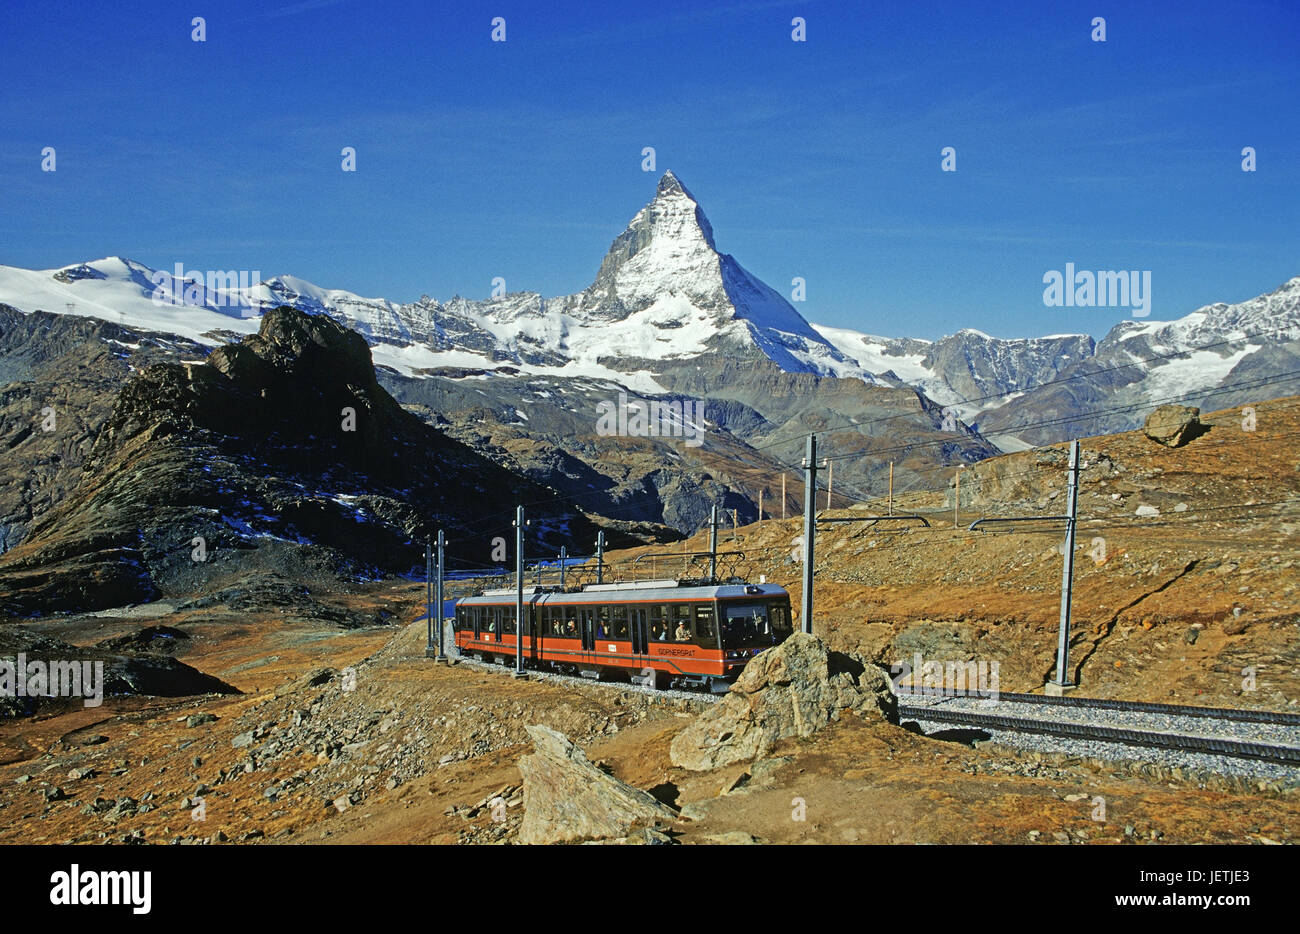 Matterhorn with corner burr road, Matterhorn mit Cornergrat Bahn Stock Photo